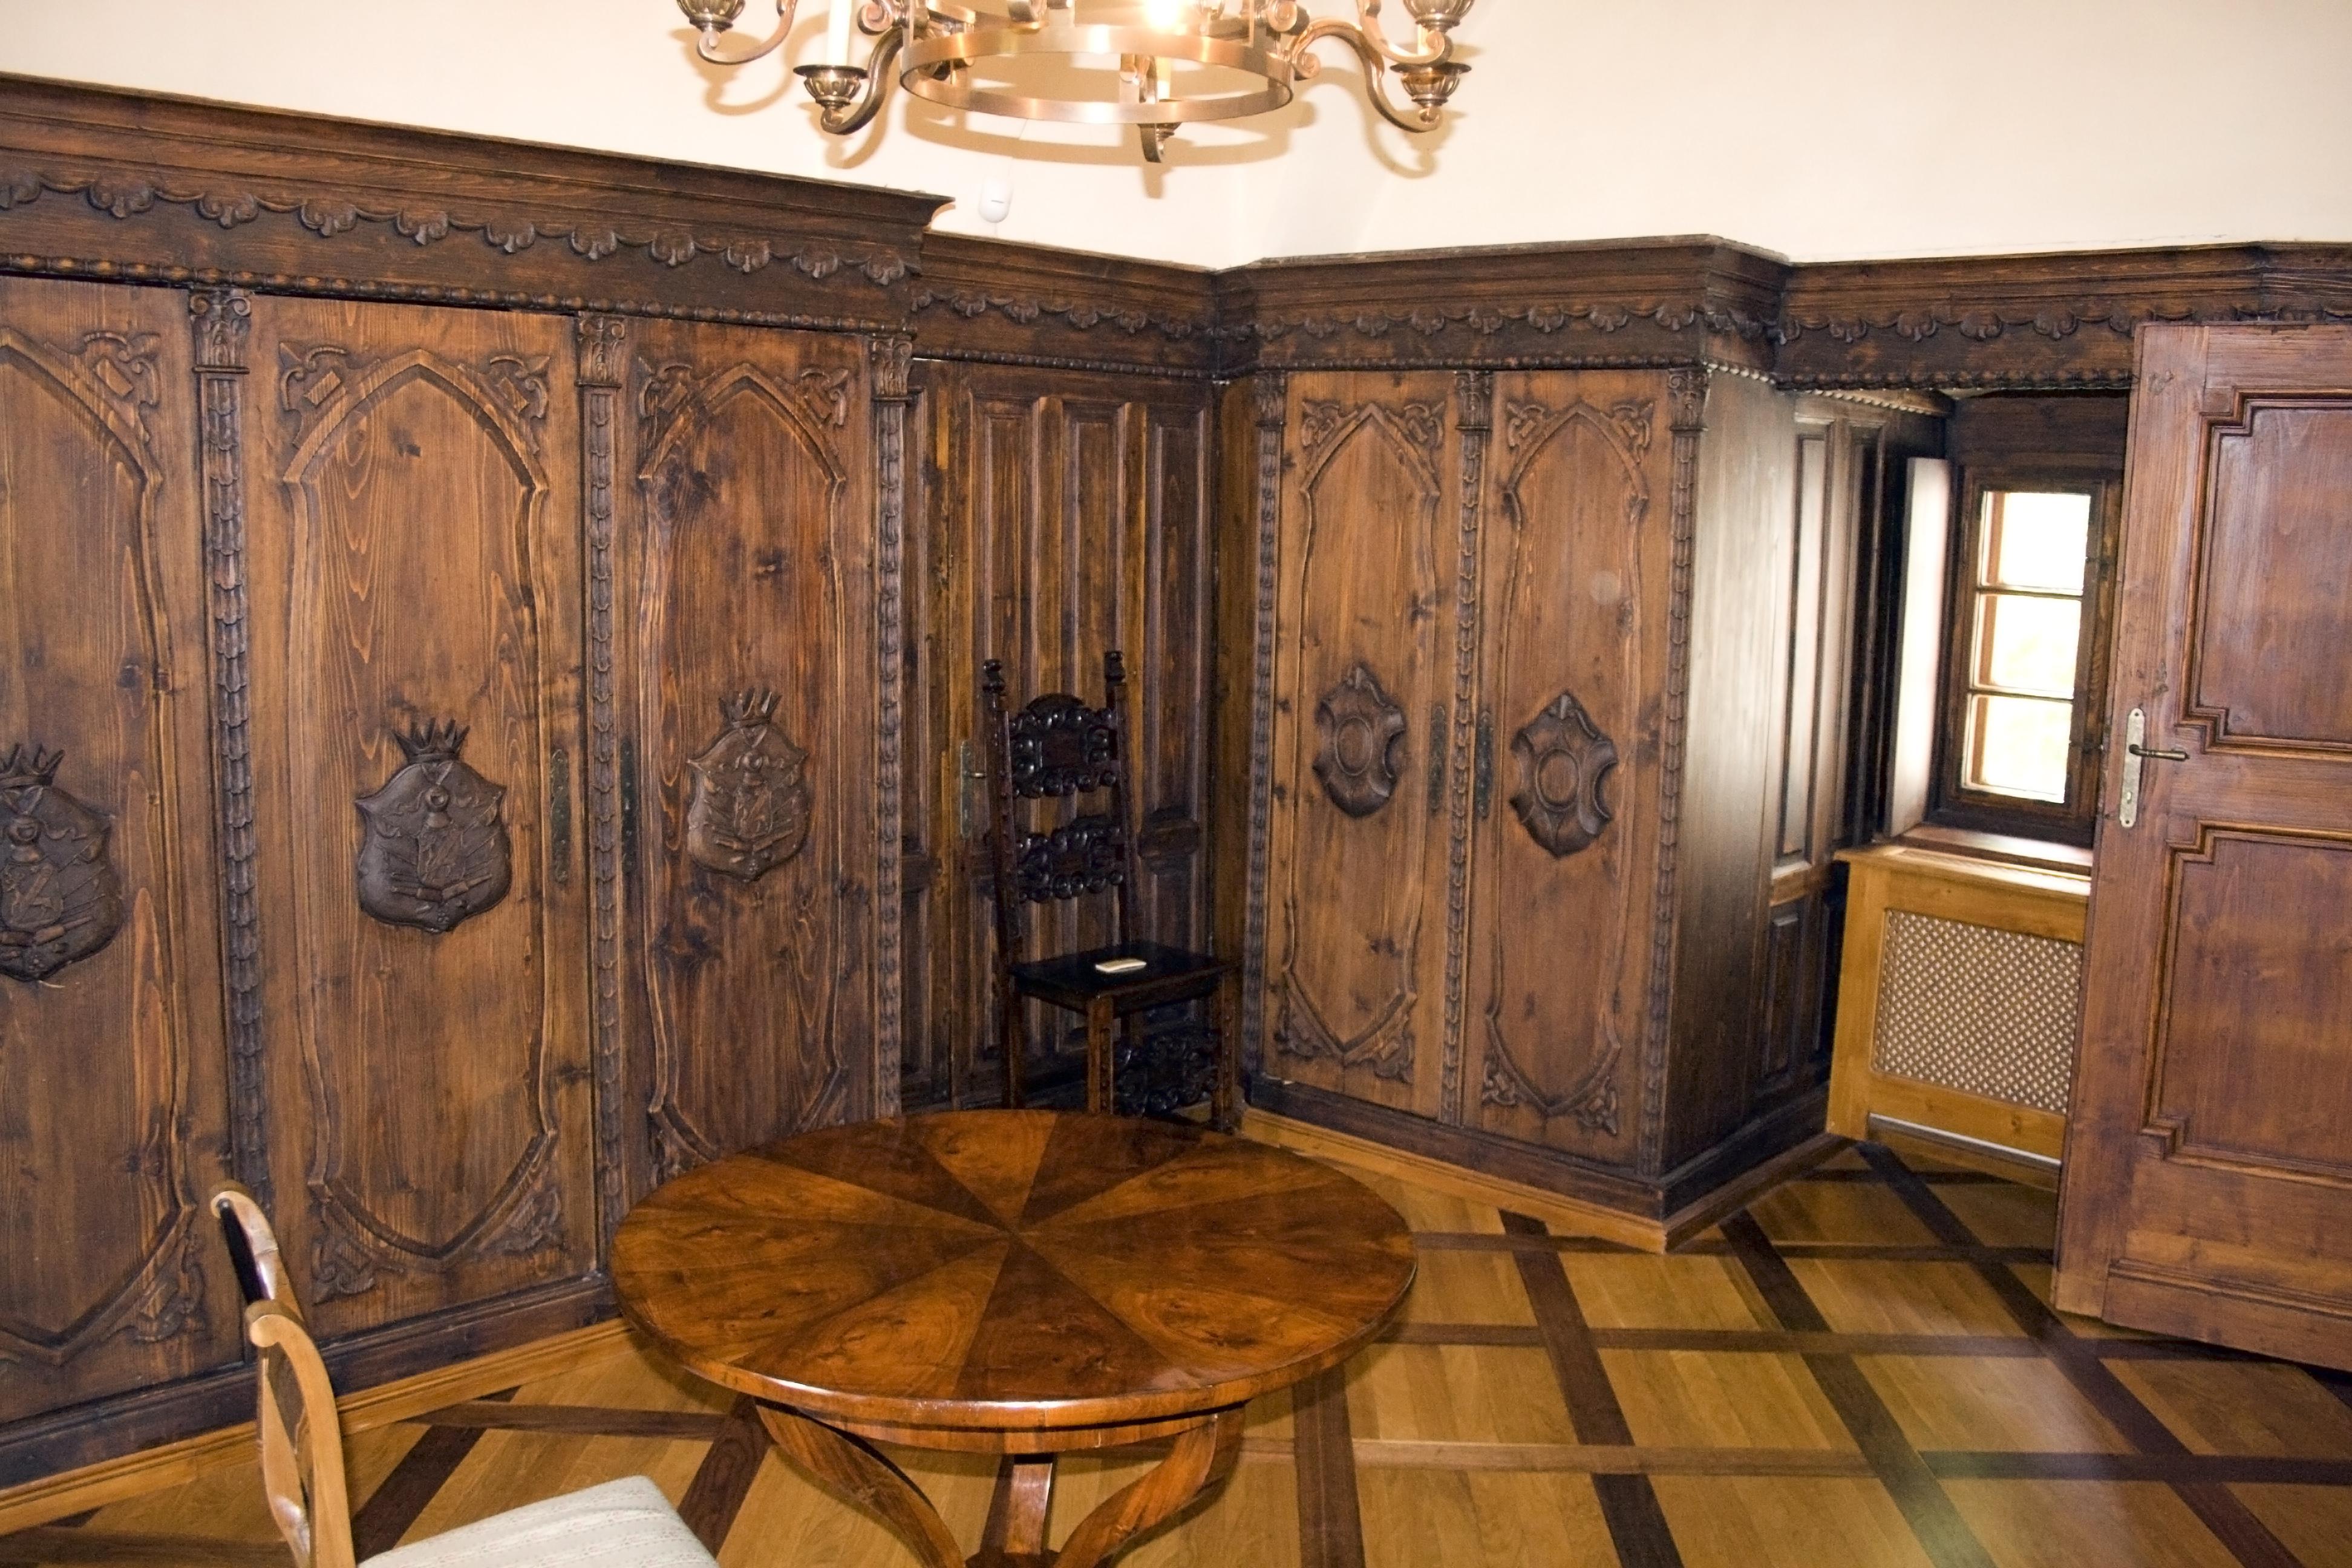 File:Fully Furnished Room